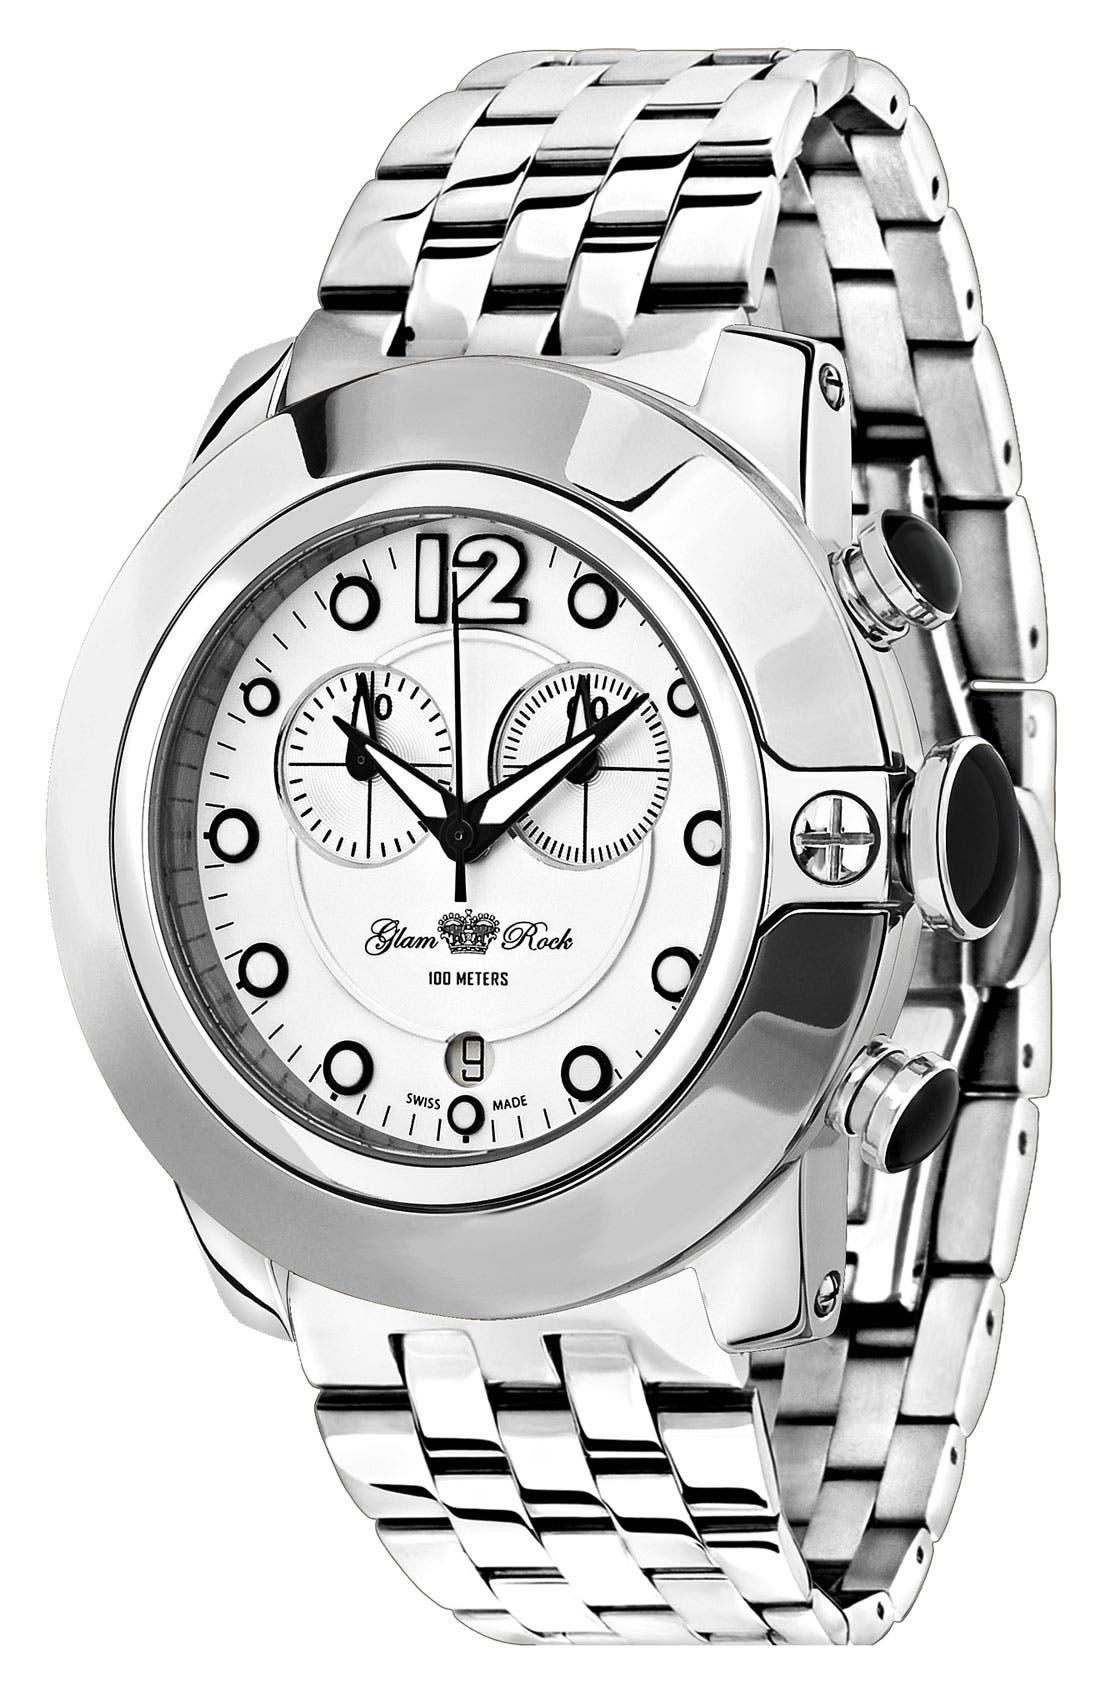 Alternate Image 1 Selected - Glam Rock 'So Be Mood' Bracelet Watch